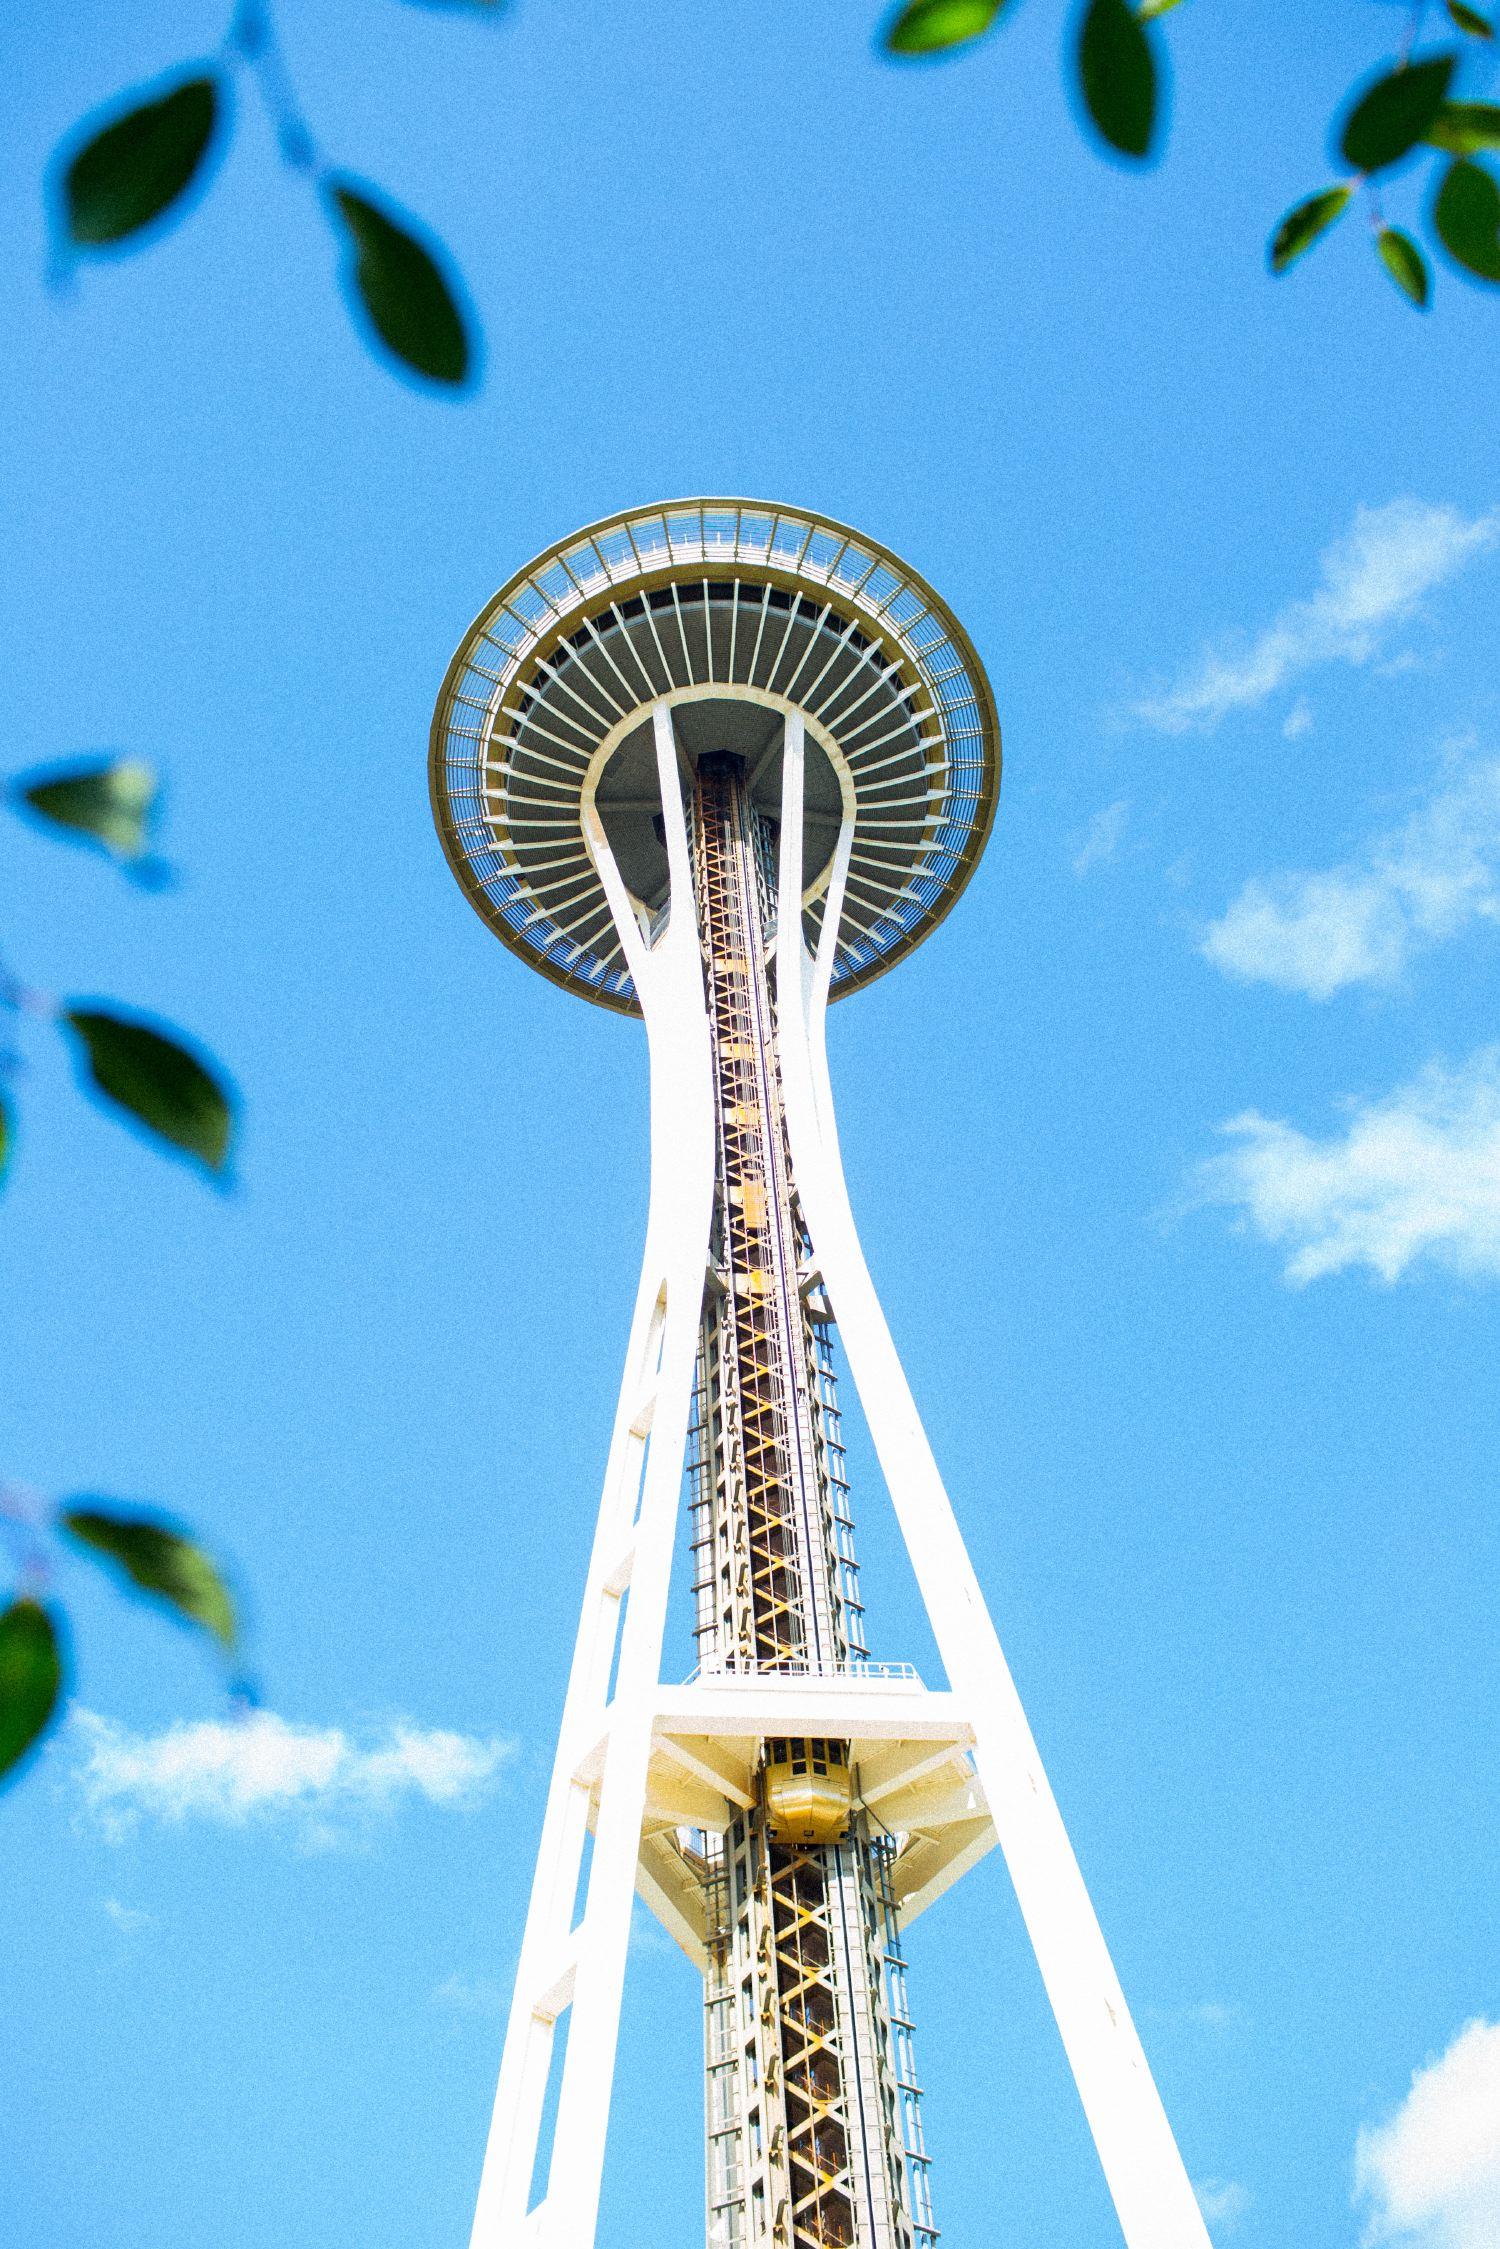 You've Got Flair | Seattle | 002.JPG